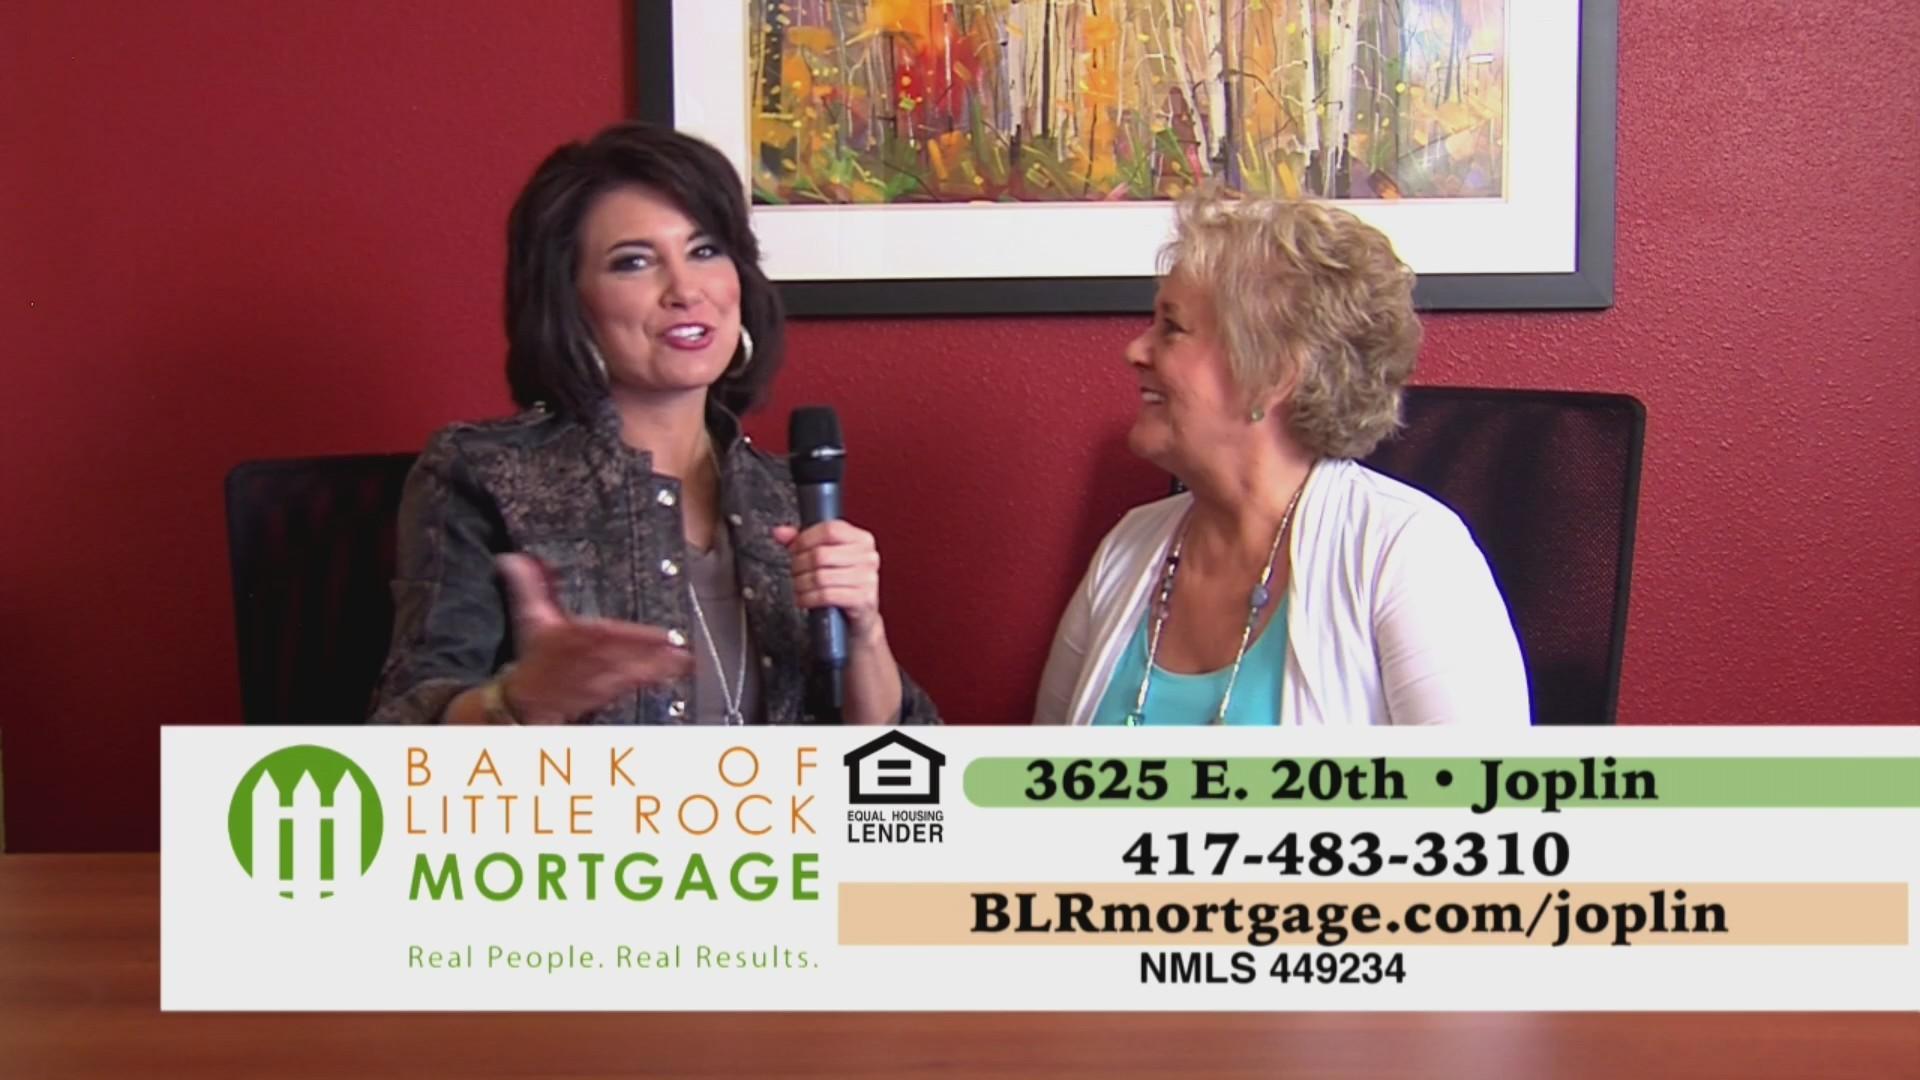 Bank of Little Rock Mortgage - April 2018 (050819)